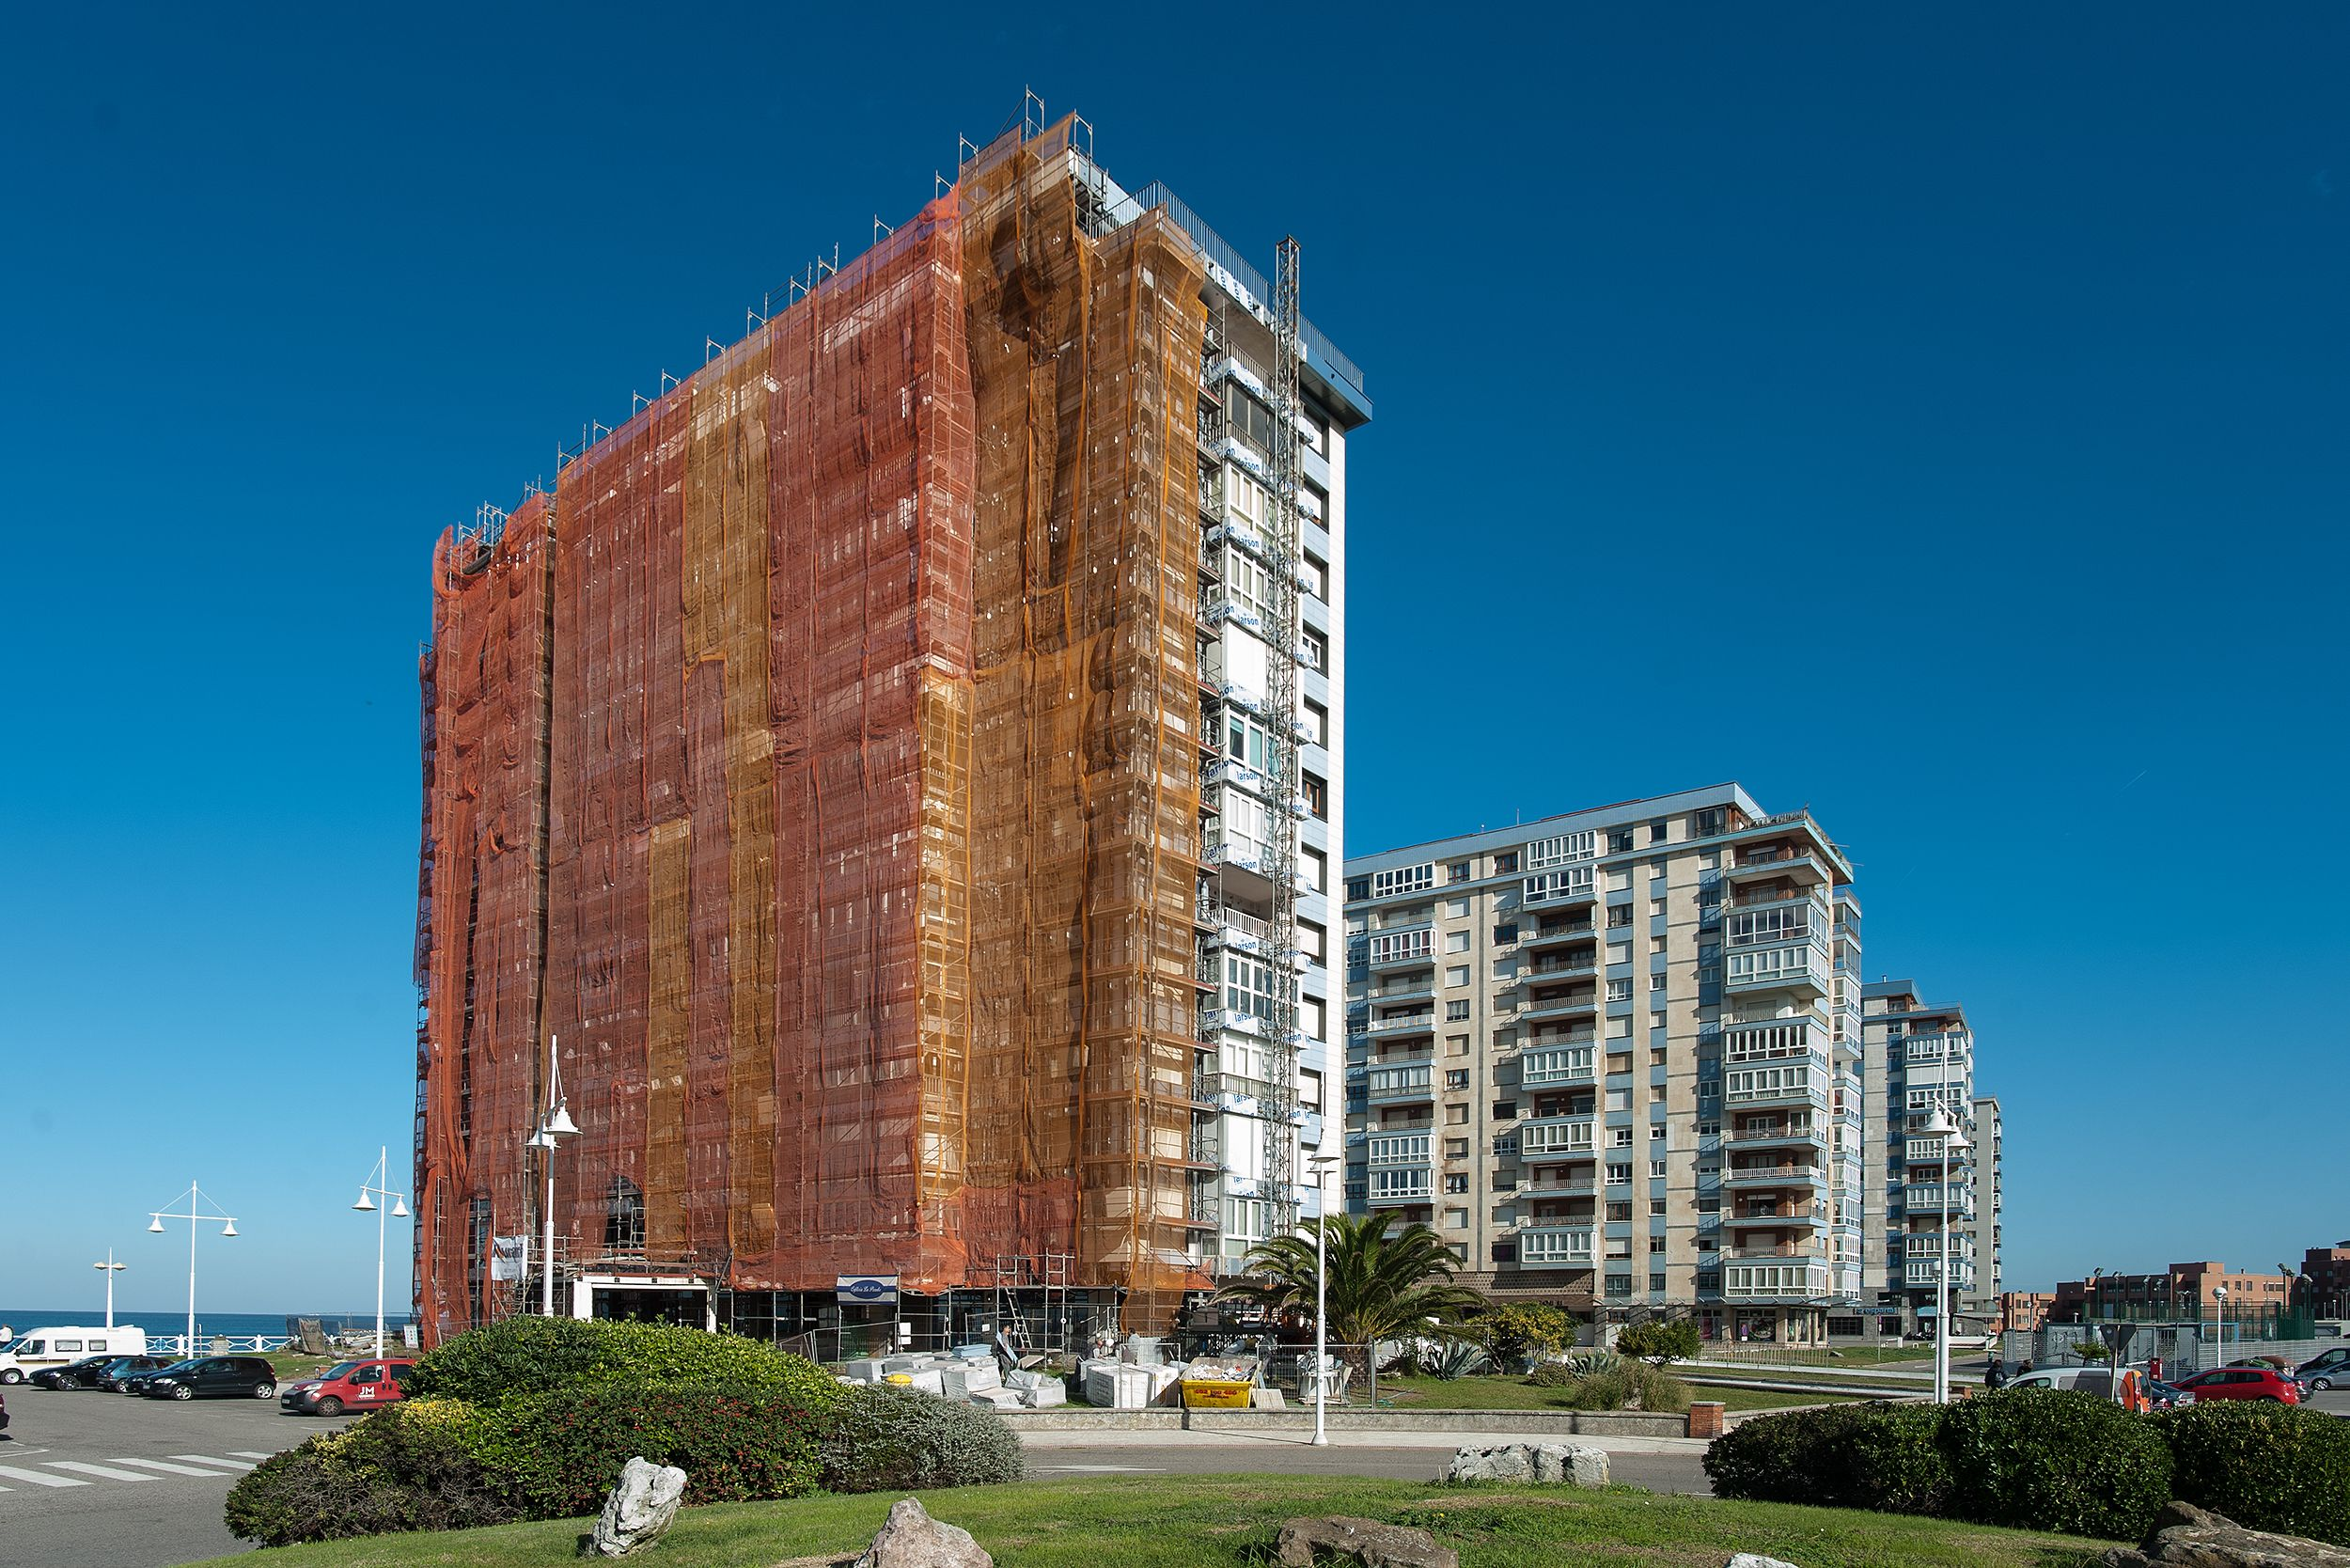 Reparación de fachadas en Mieres, Asturias